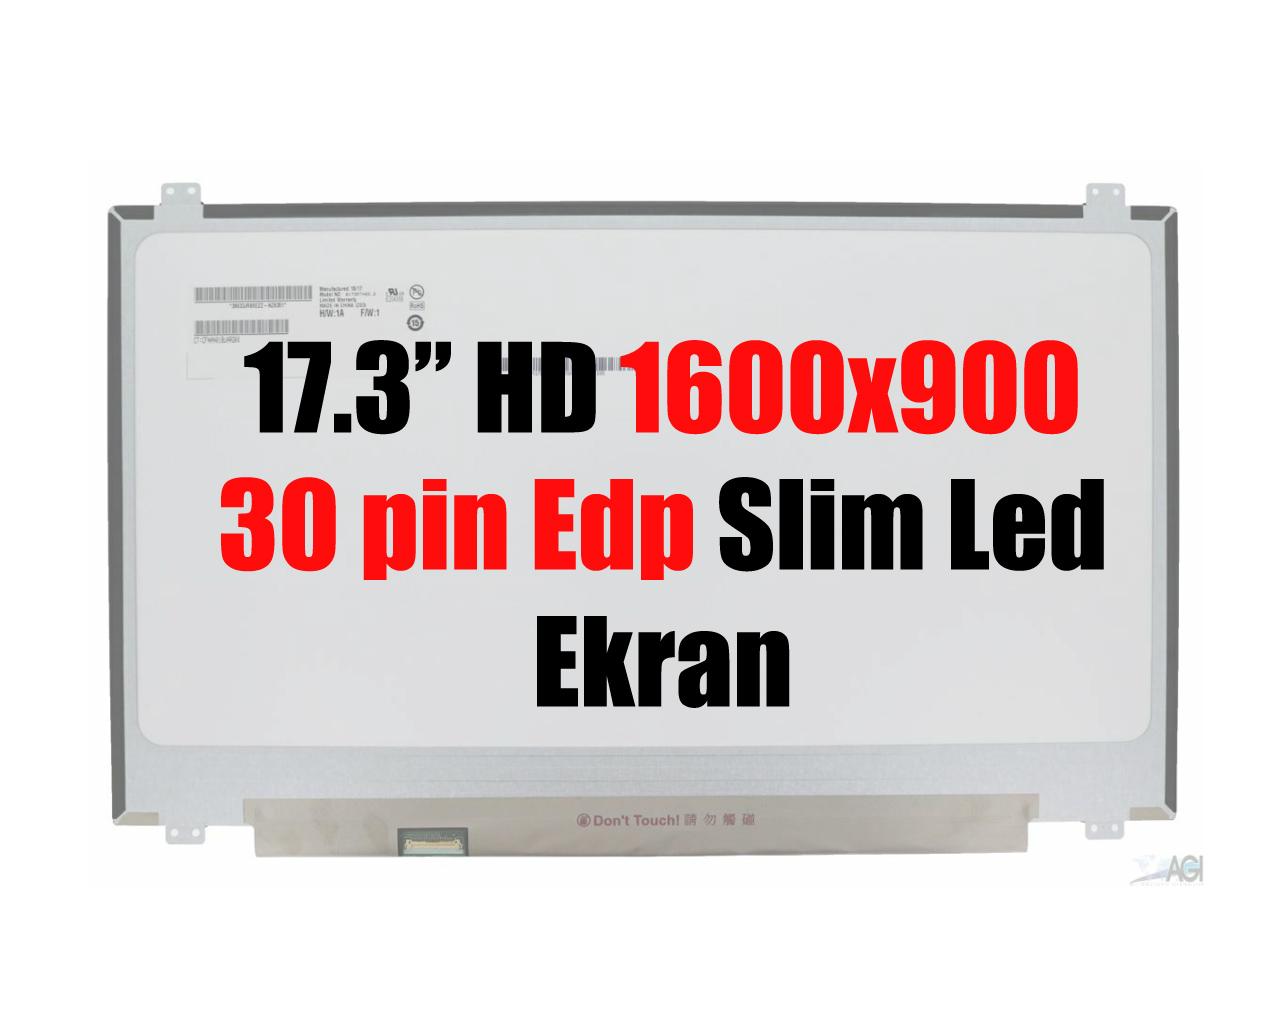 "LTN173KT04, N173FGA-E34 17.3"" Edp Slim Led 30 pin 1600x900 Ekran"